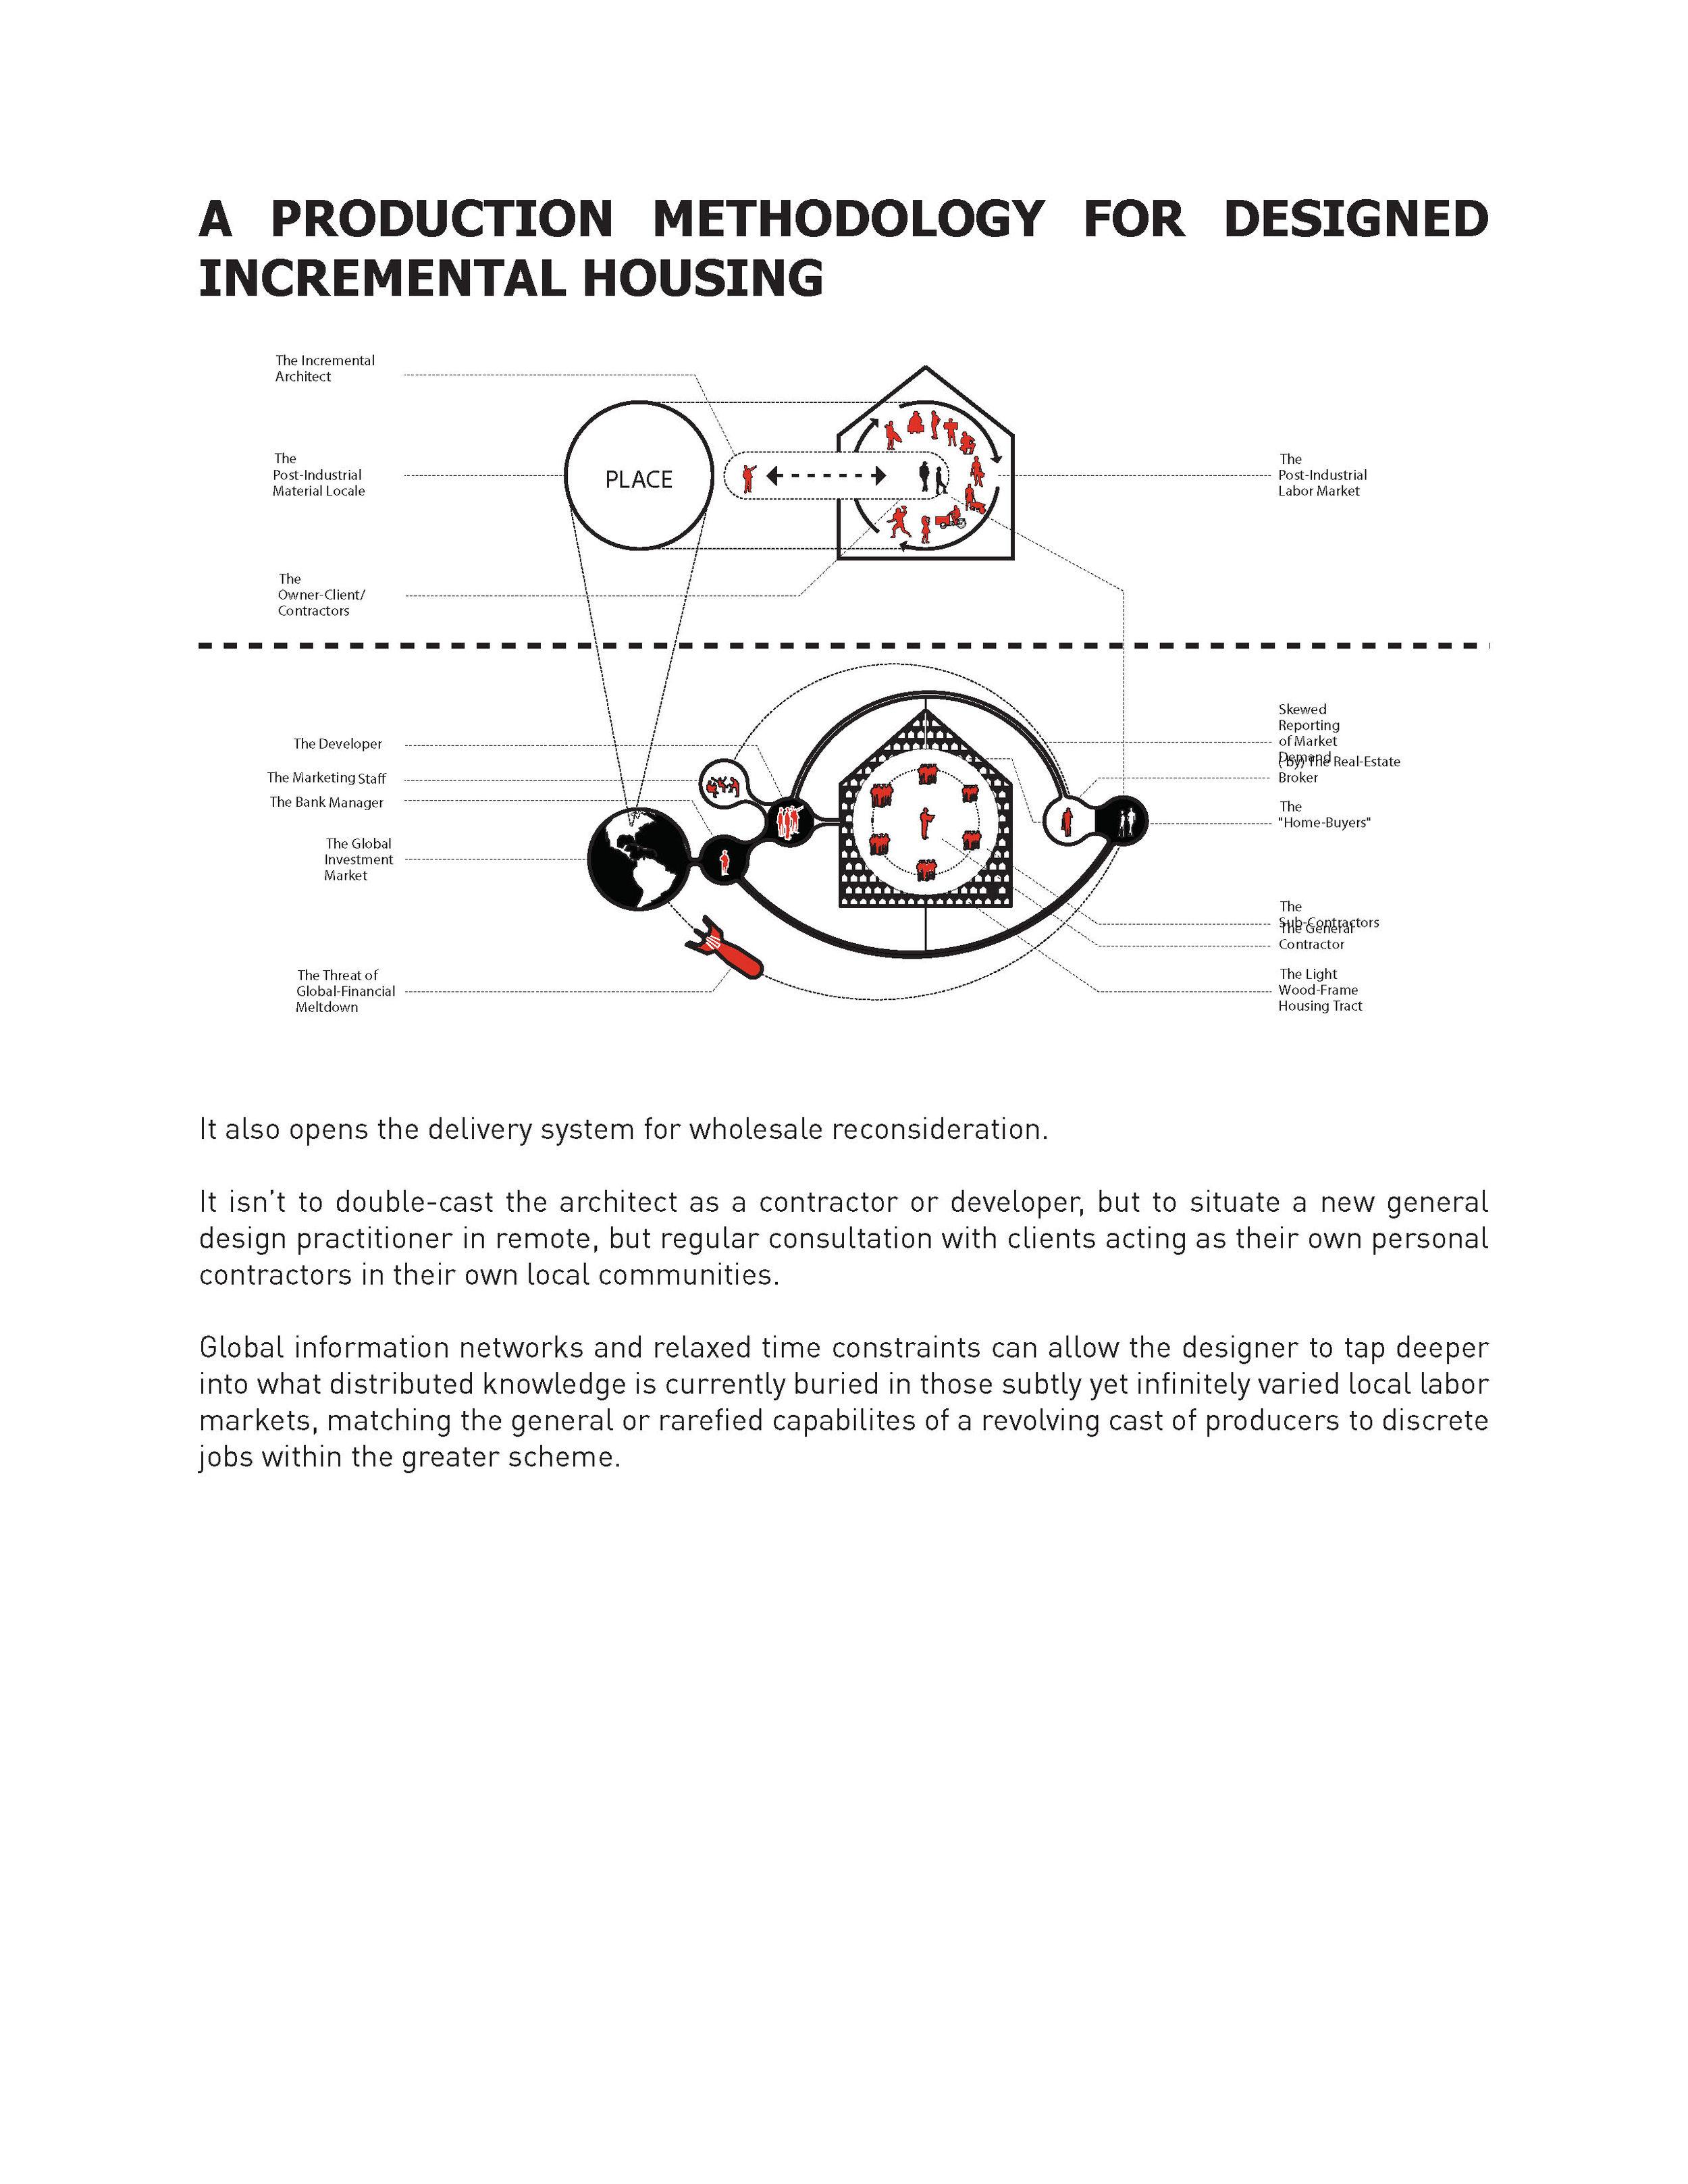 DSA_CMiller_Thesis_Slides_Boards_03_30_2013_Page_08.jpg